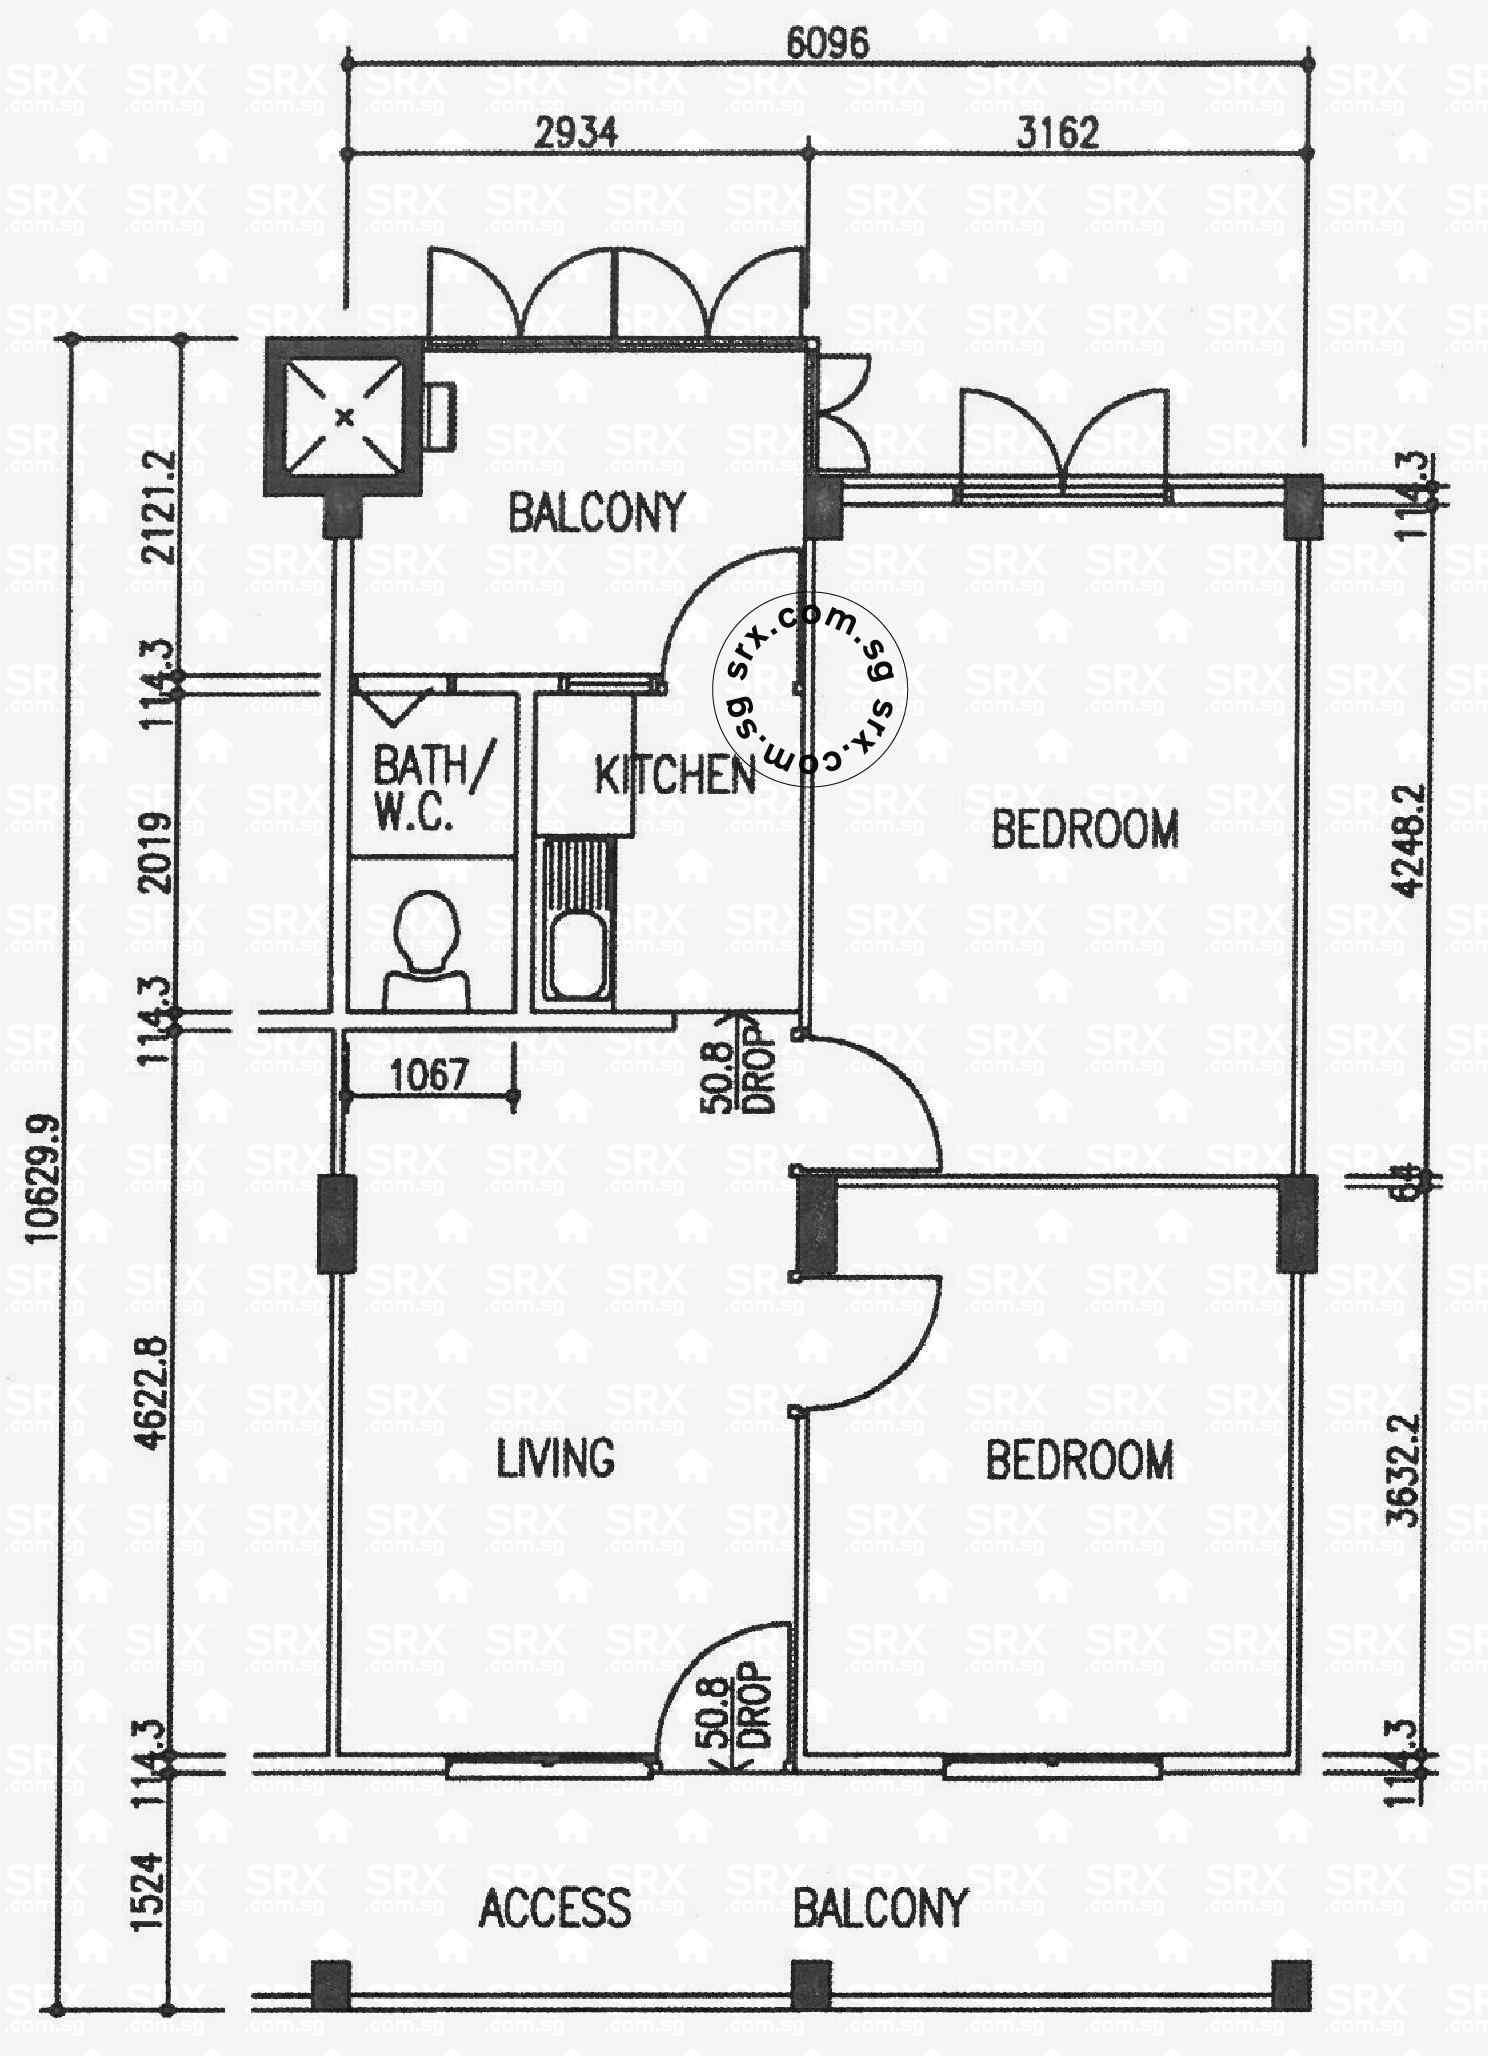 Floor plans for jalan tiga hdb details srx property levellvl 09 ccuart Gallery